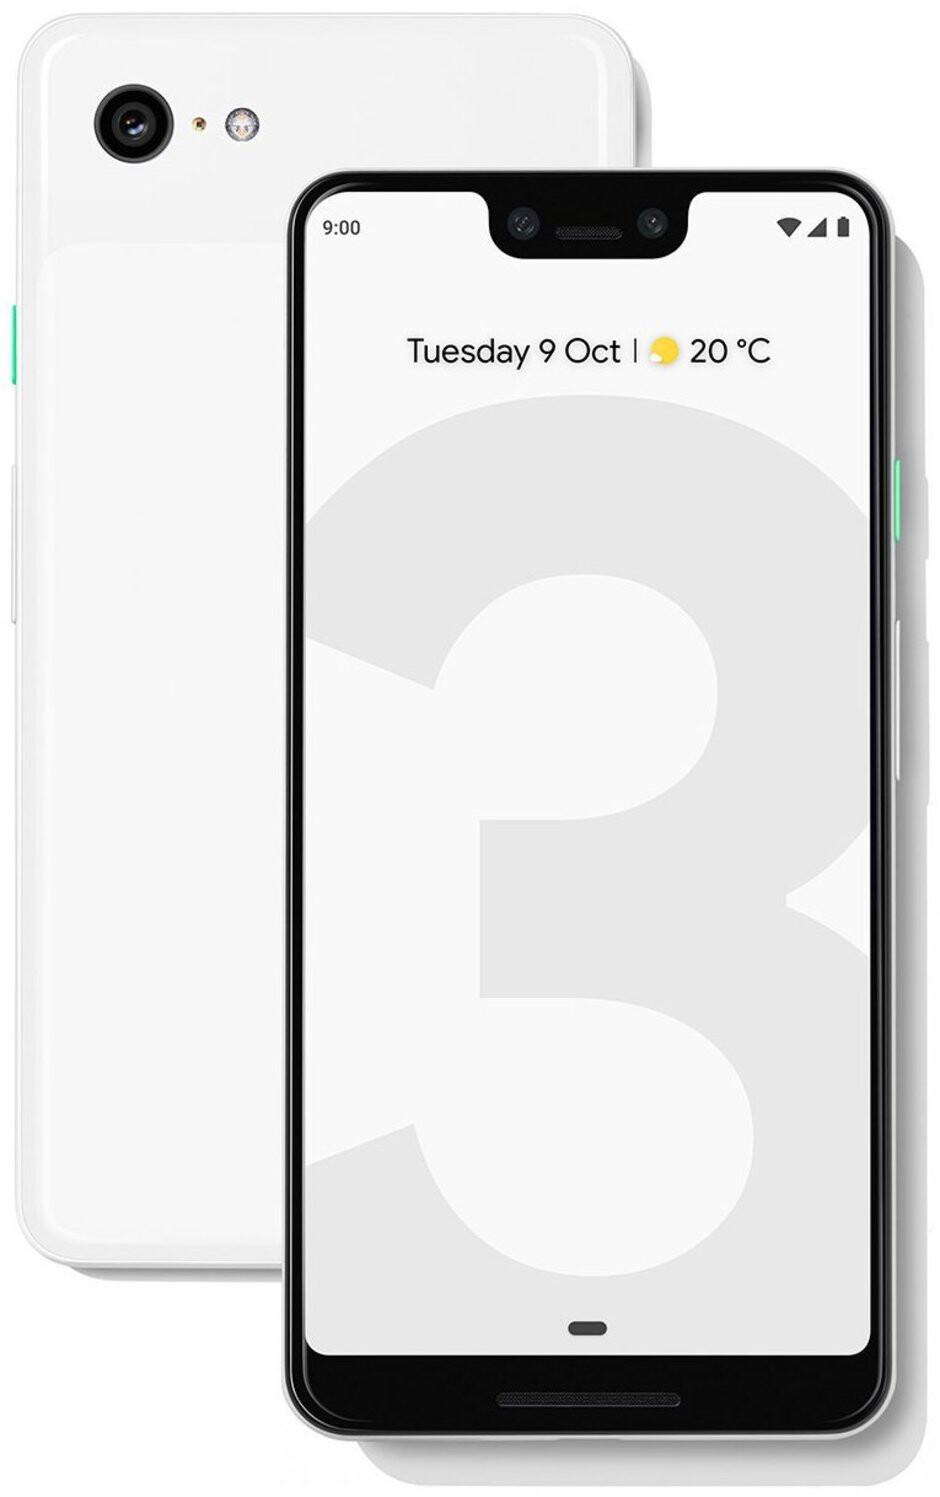 Official Pixel 3 XL press image leaks, flaunting minimalist stock wallpaper